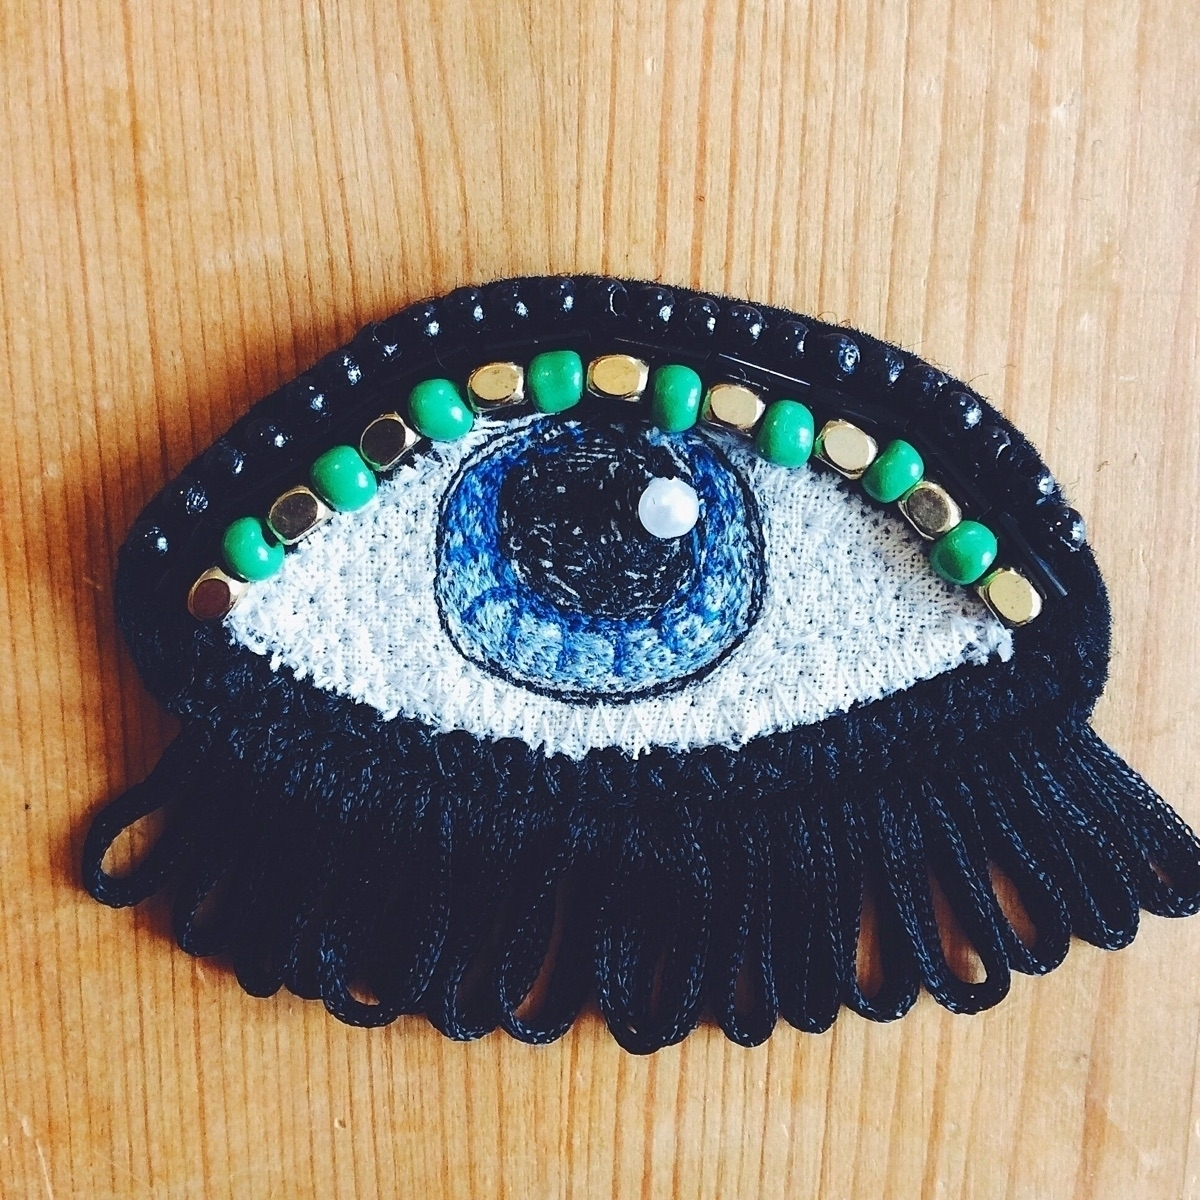 Merging eye brooches bags, maki - alittlevintagedoll | ello